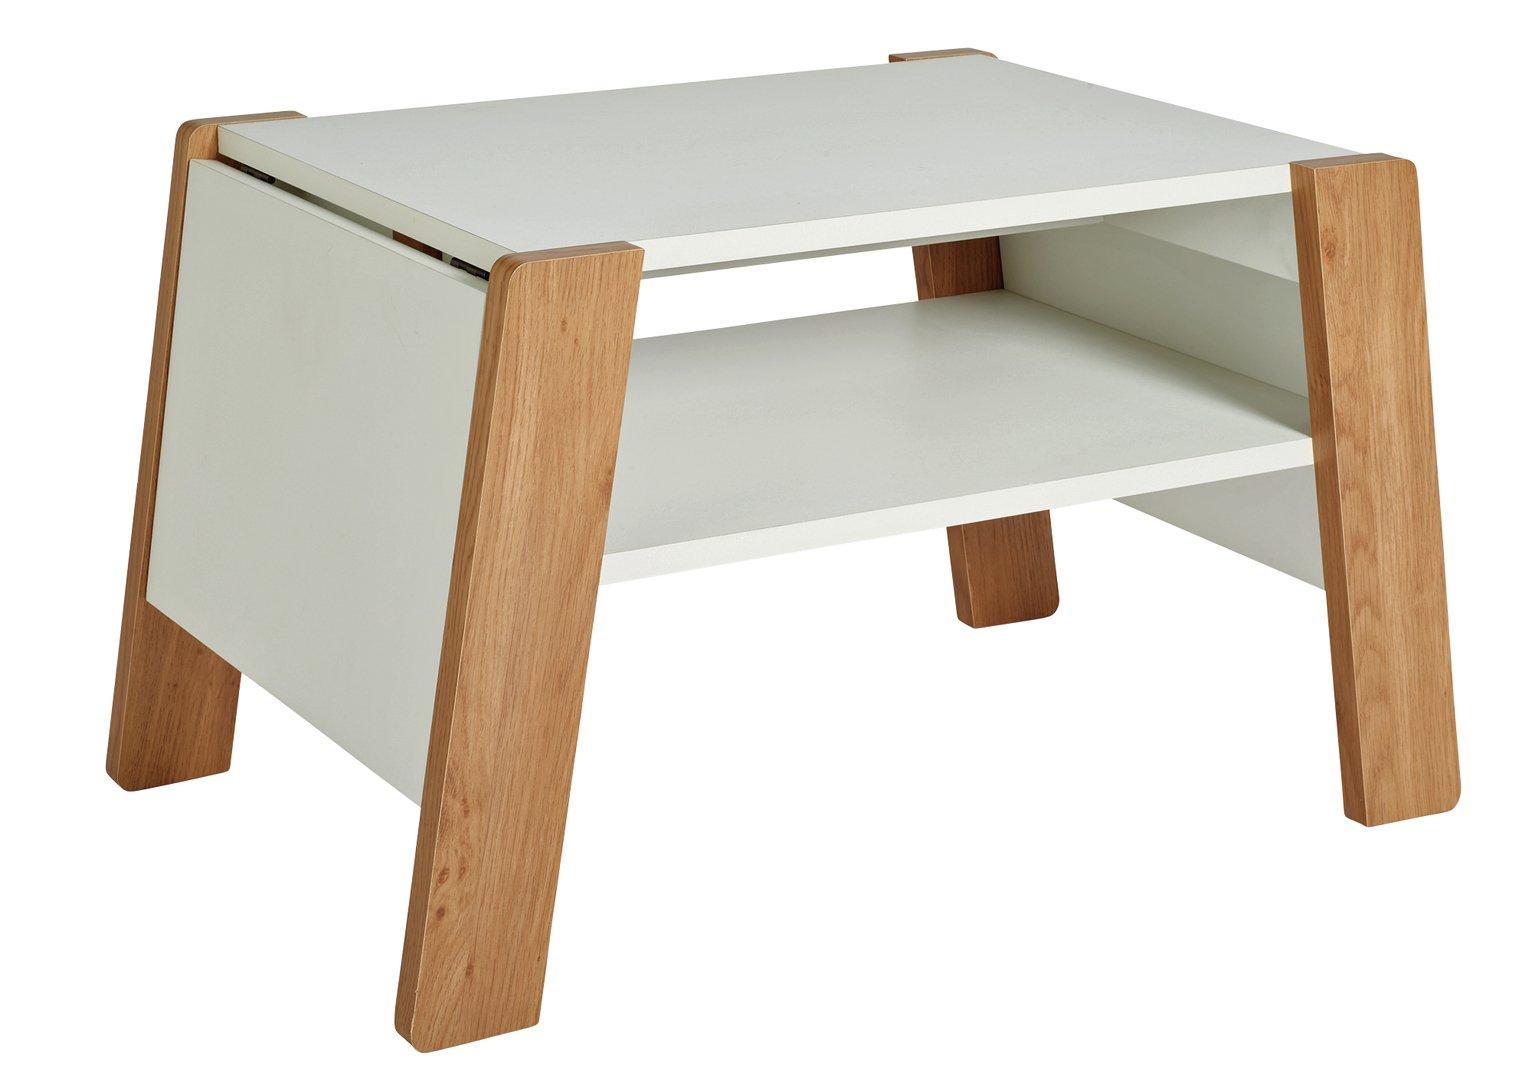 Argos Home Zander Extendable Coffee Table - White